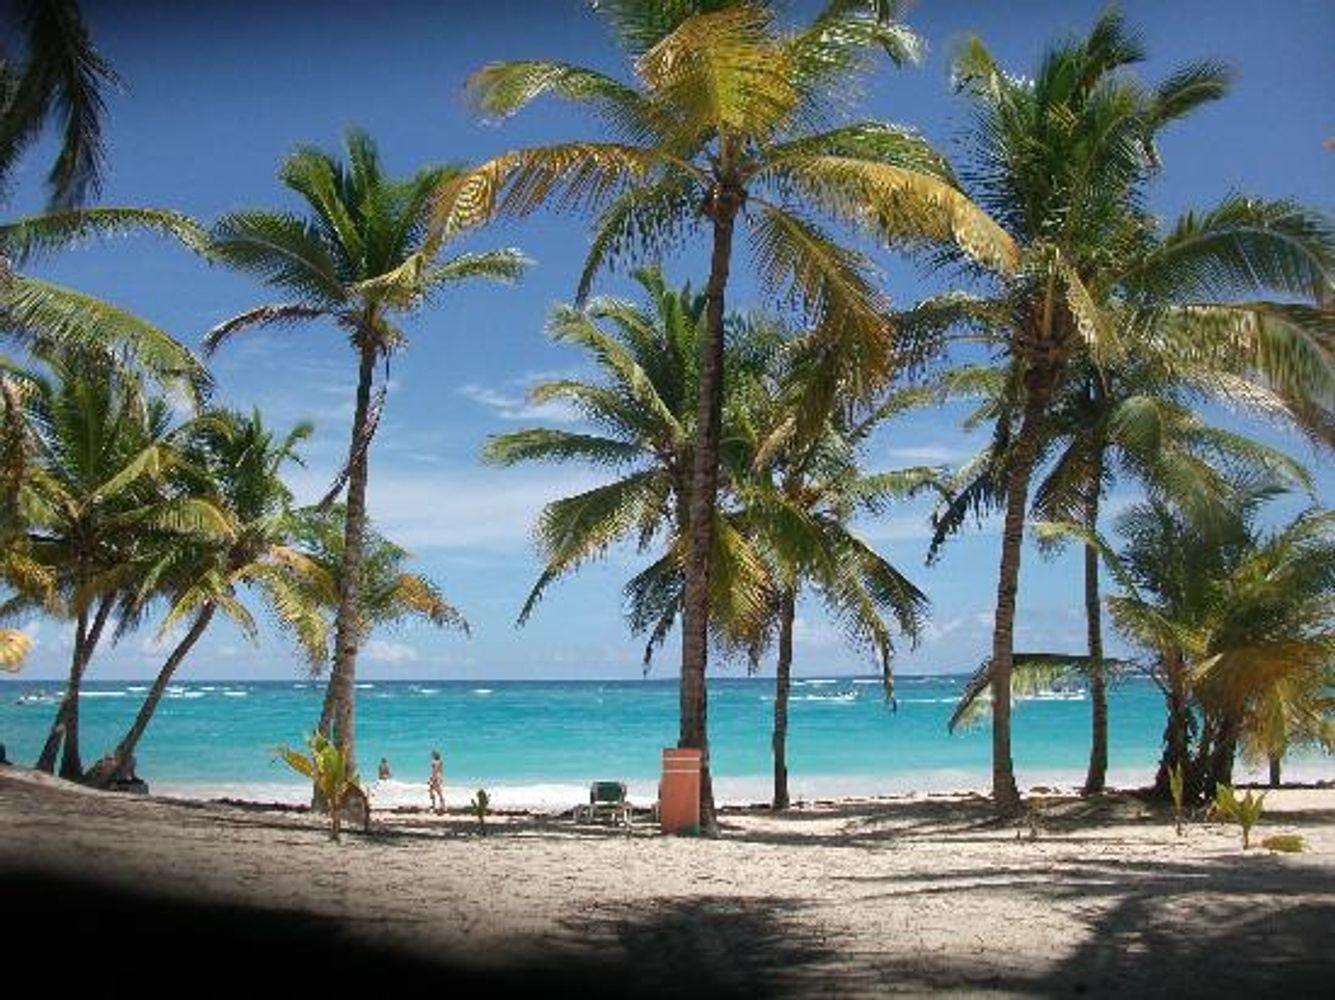 Dominican Punta Cana 8 days, Hotel Riu Palace Macao 5 * all inclusive